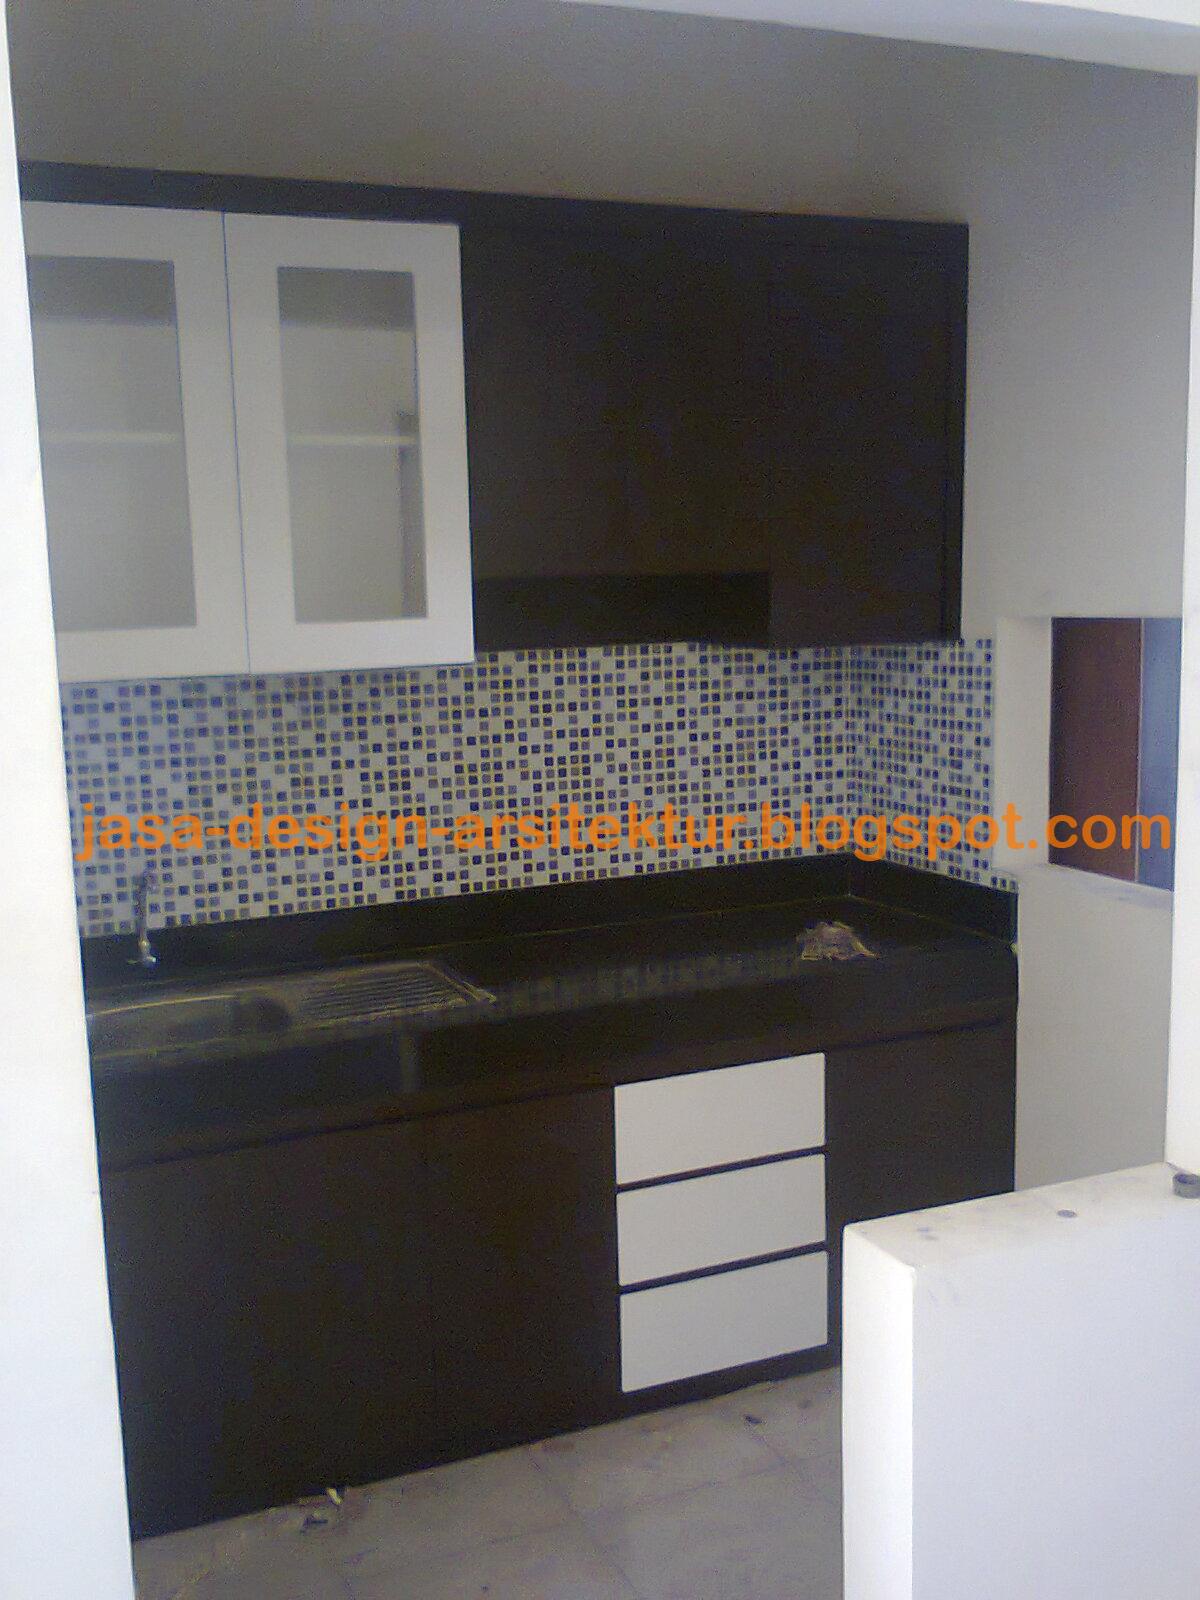 Kontraktor interior surabaya sidoarjo contoh pekerjaan for Cara bikin kitchen set